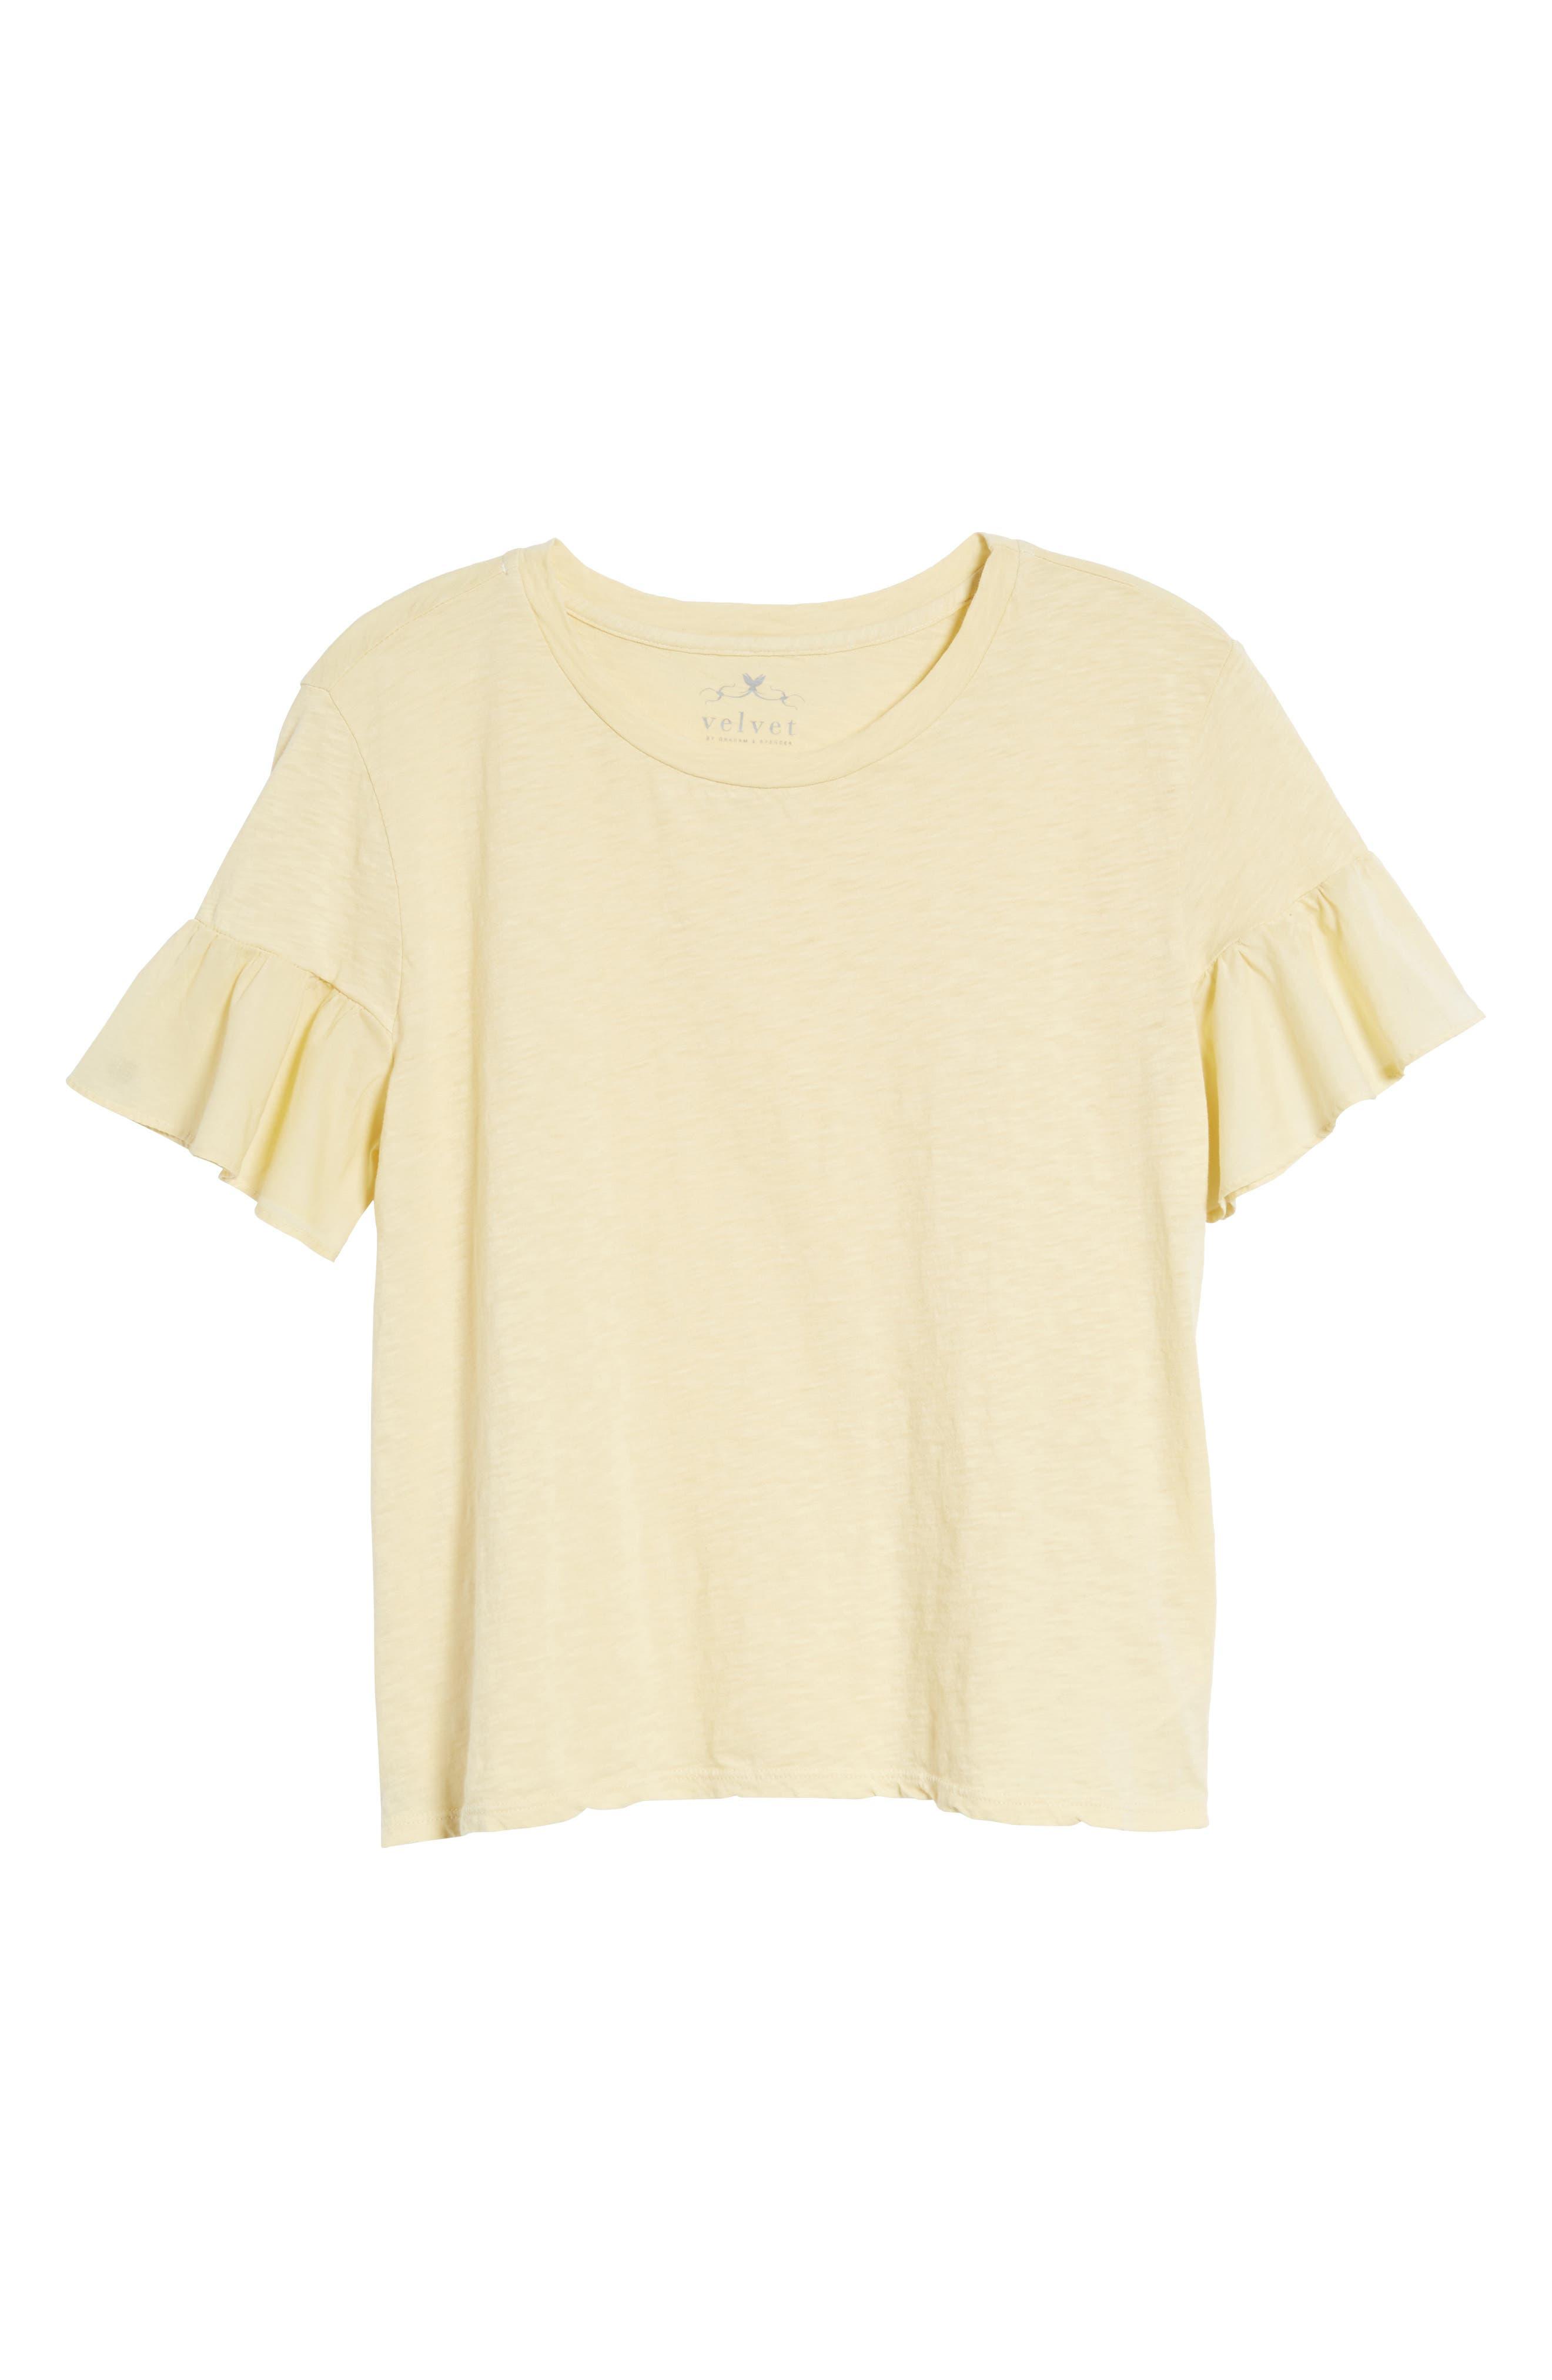 Slub Cotton Voile Sleeve Tee,                             Alternate thumbnail 6, color,                             CHICK YELLOW